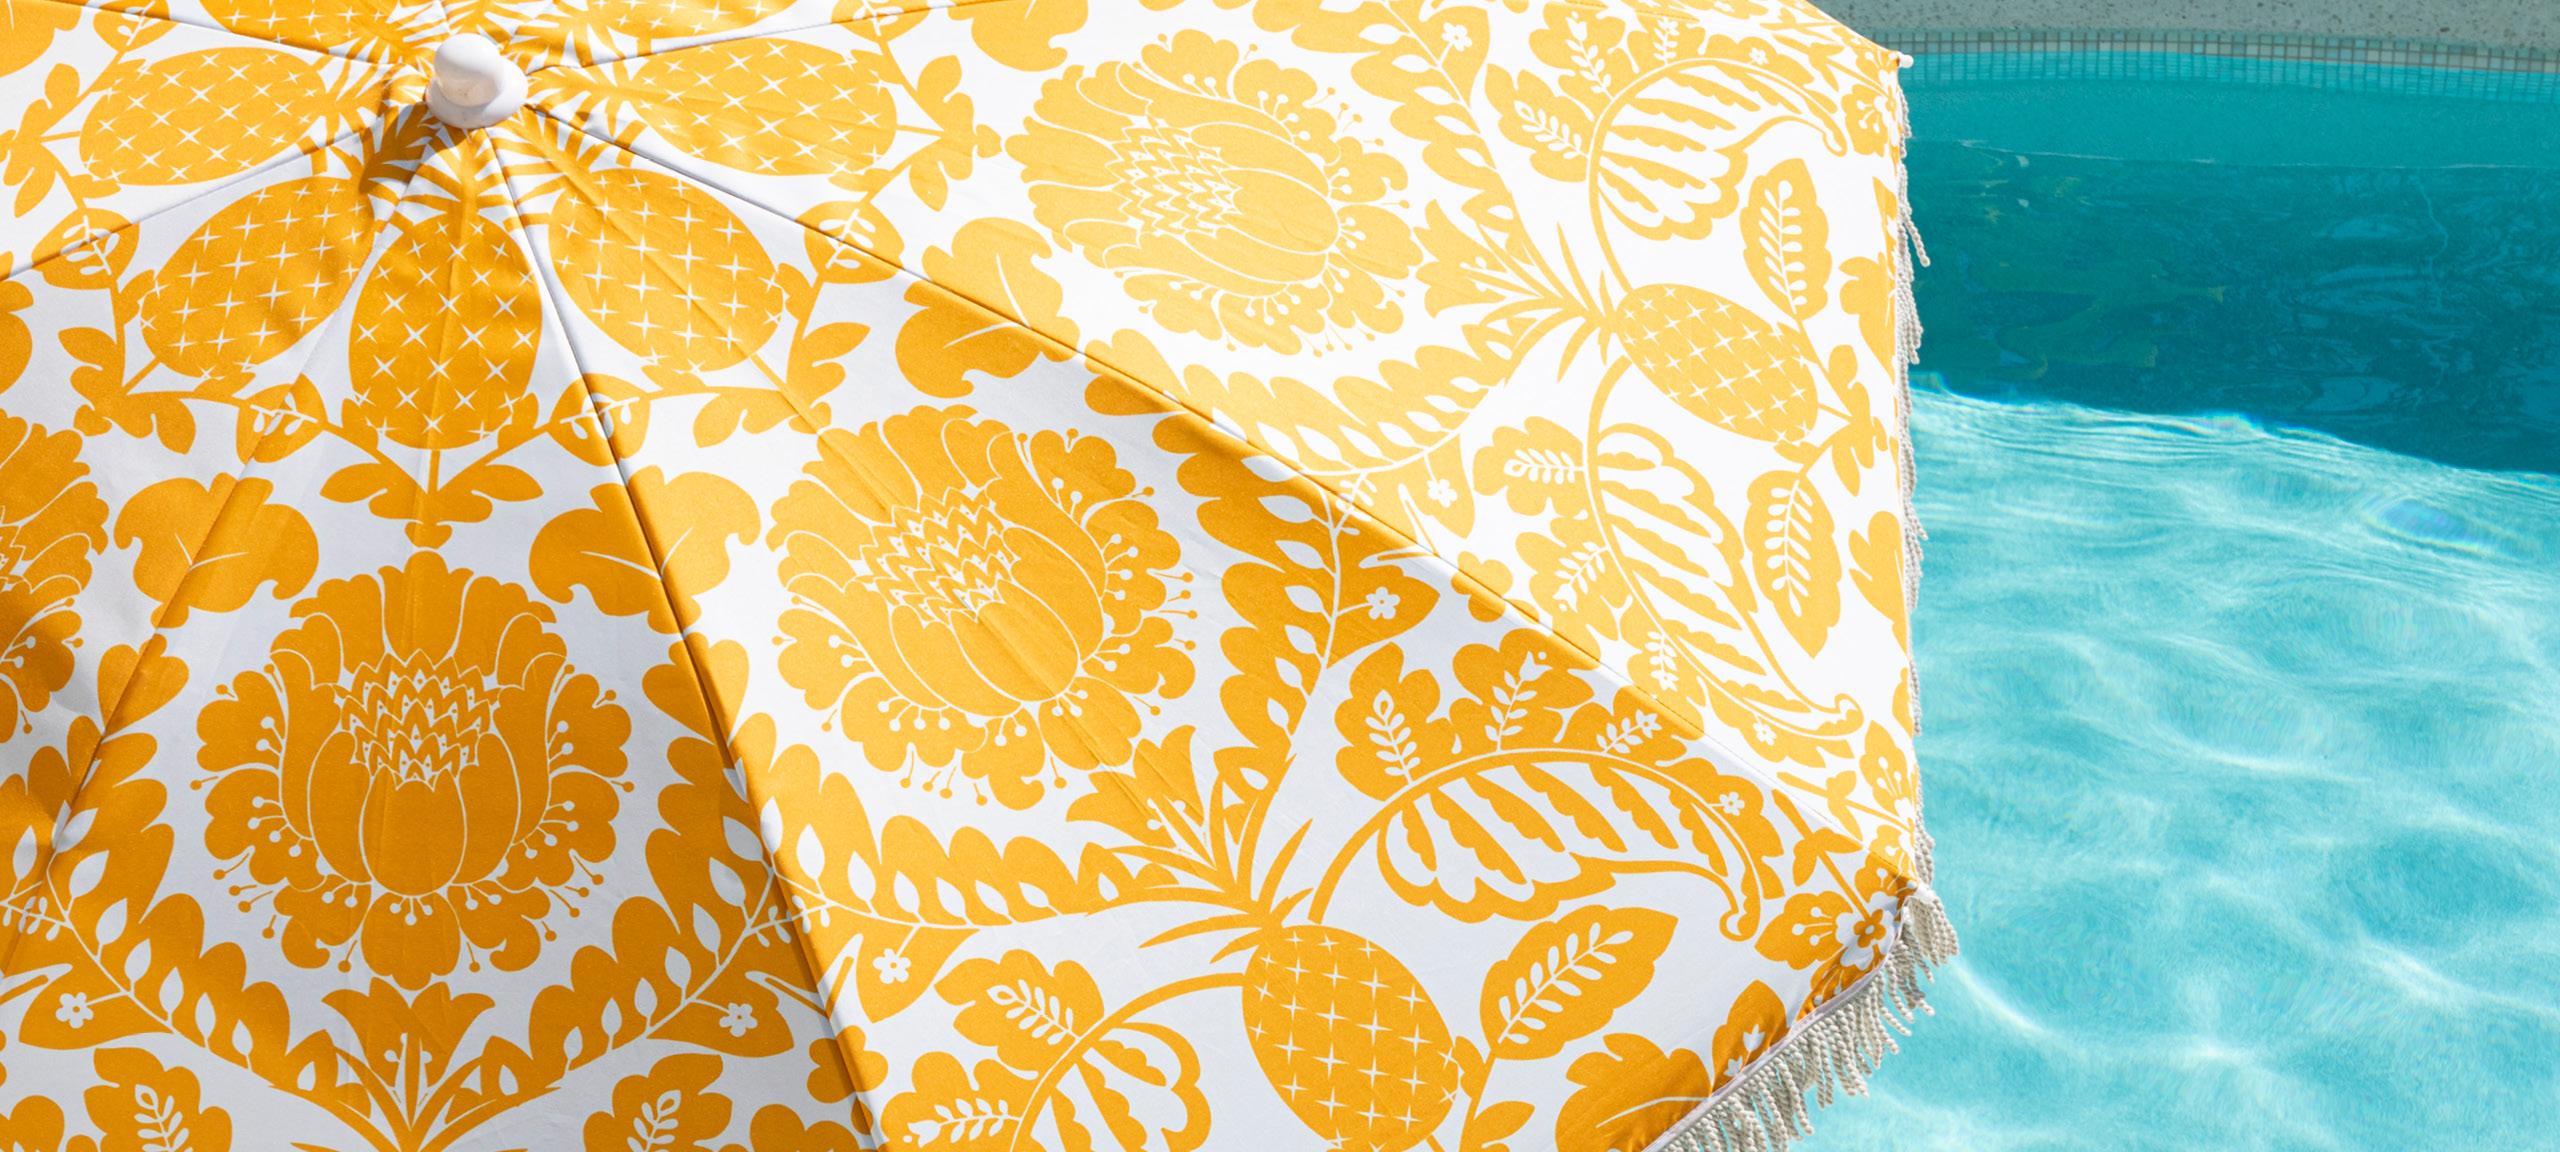 yellow printed beach umbrella